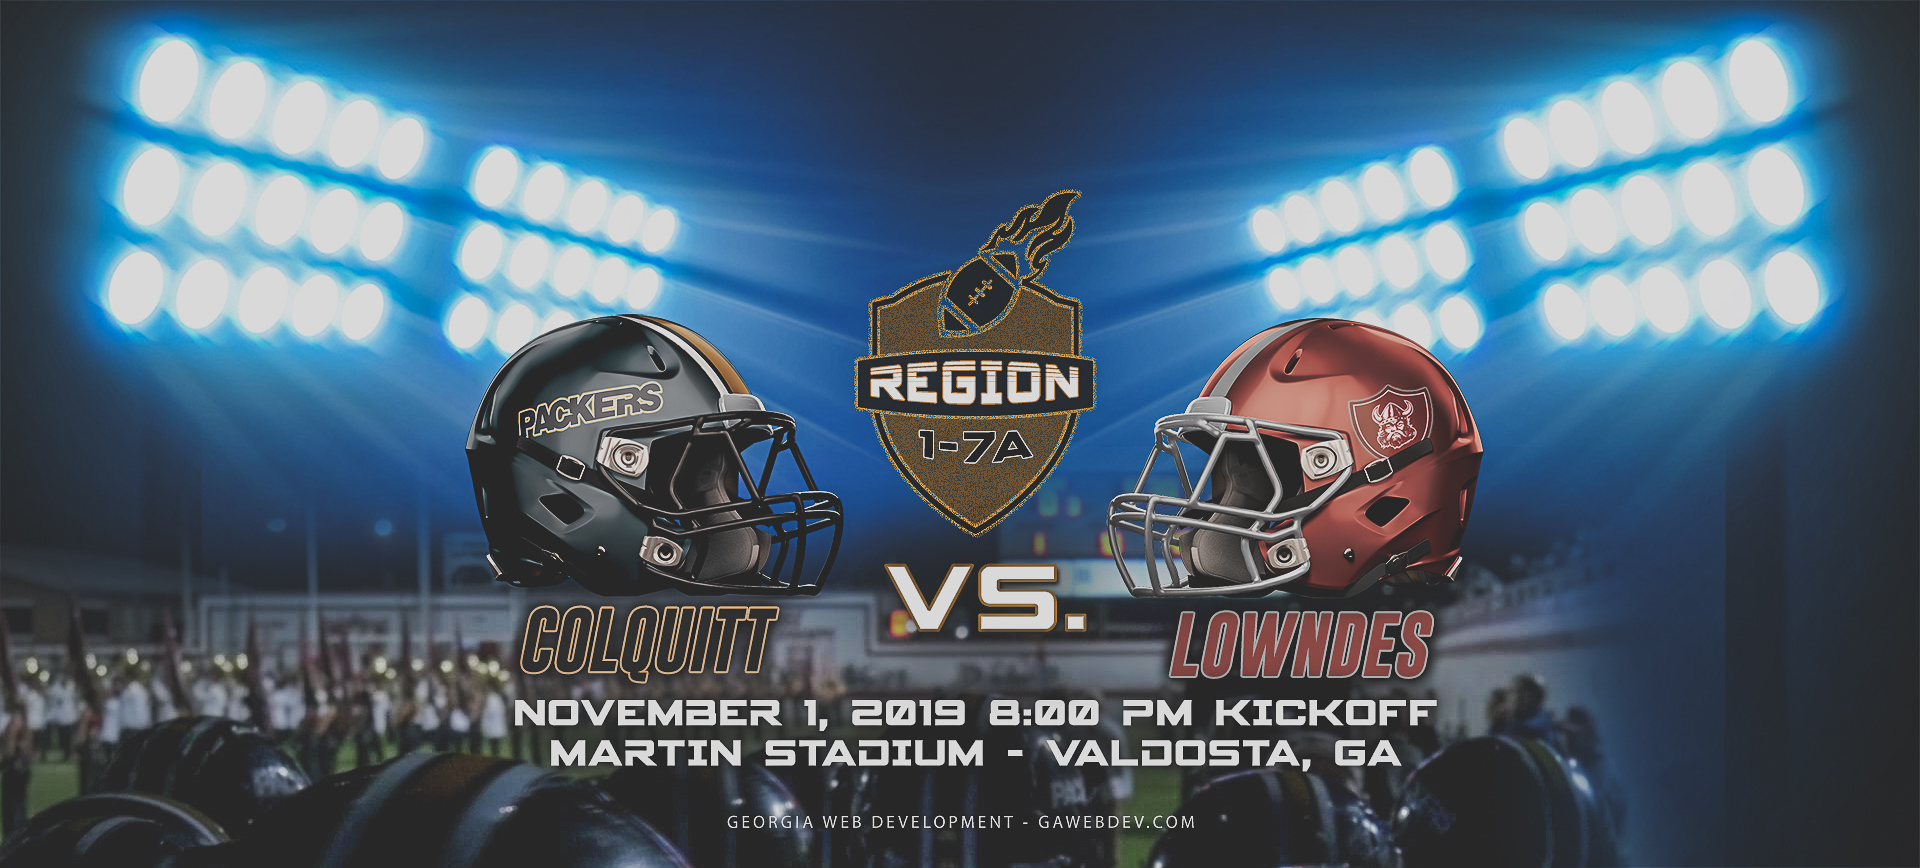 Colquitt vs. Lowndes 2019 High School Football